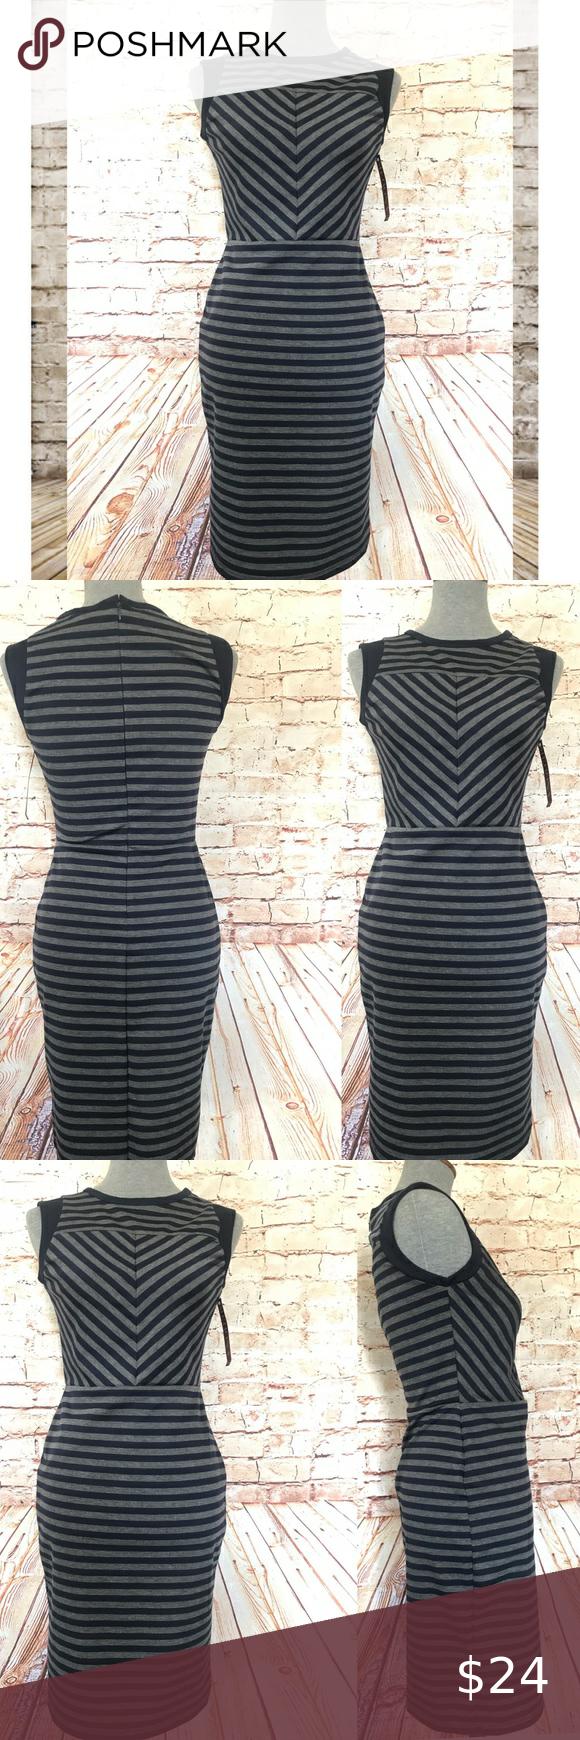 Nwt This Beautiful Summer Bodycon Dress Summer Bodycon Dress Bodycon Dress Dresses [ 1740 x 580 Pixel ]